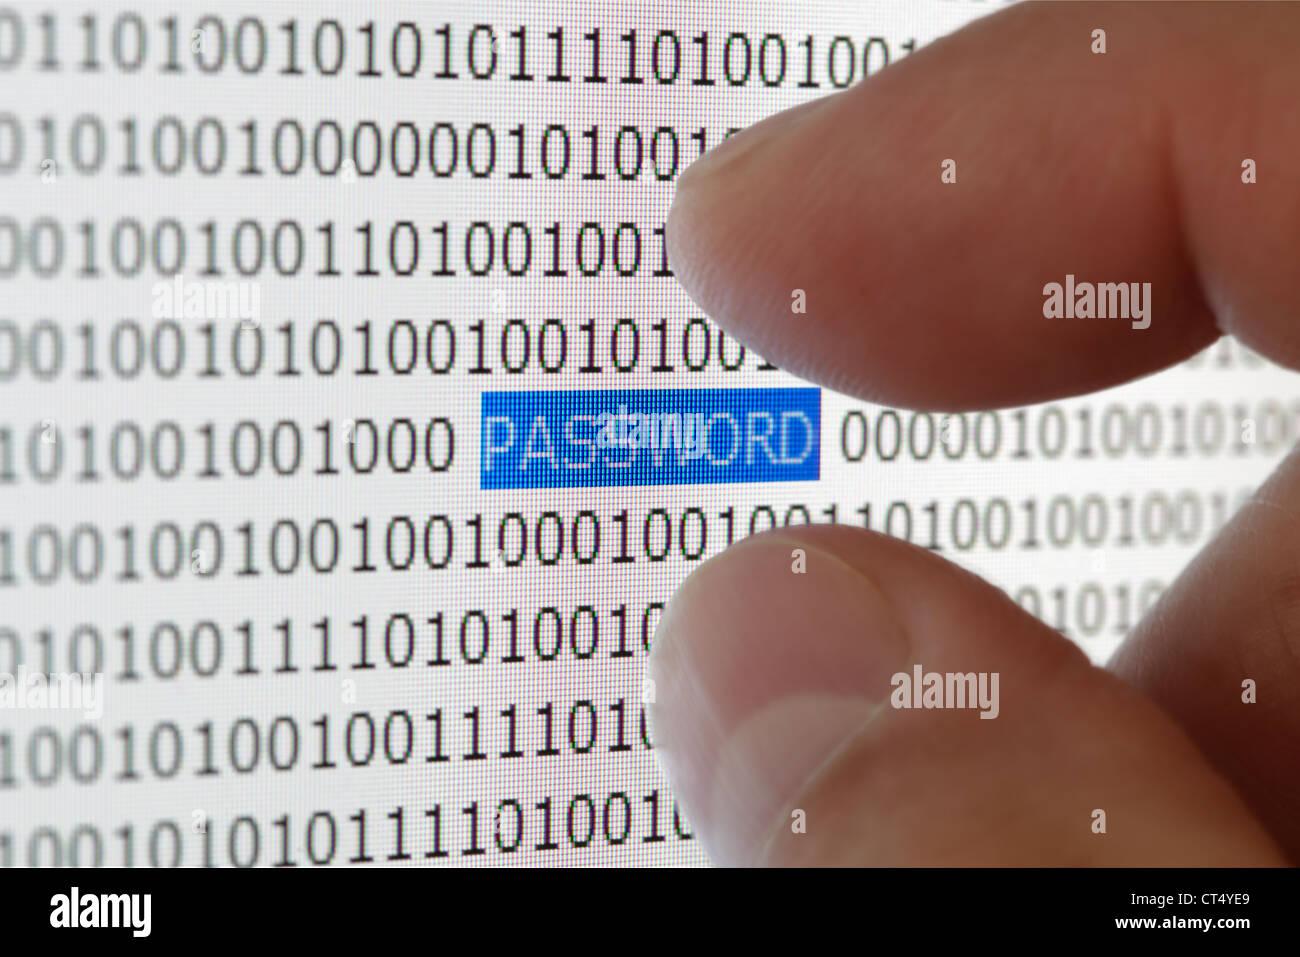 Passwort-Sicherheit Stockfoto